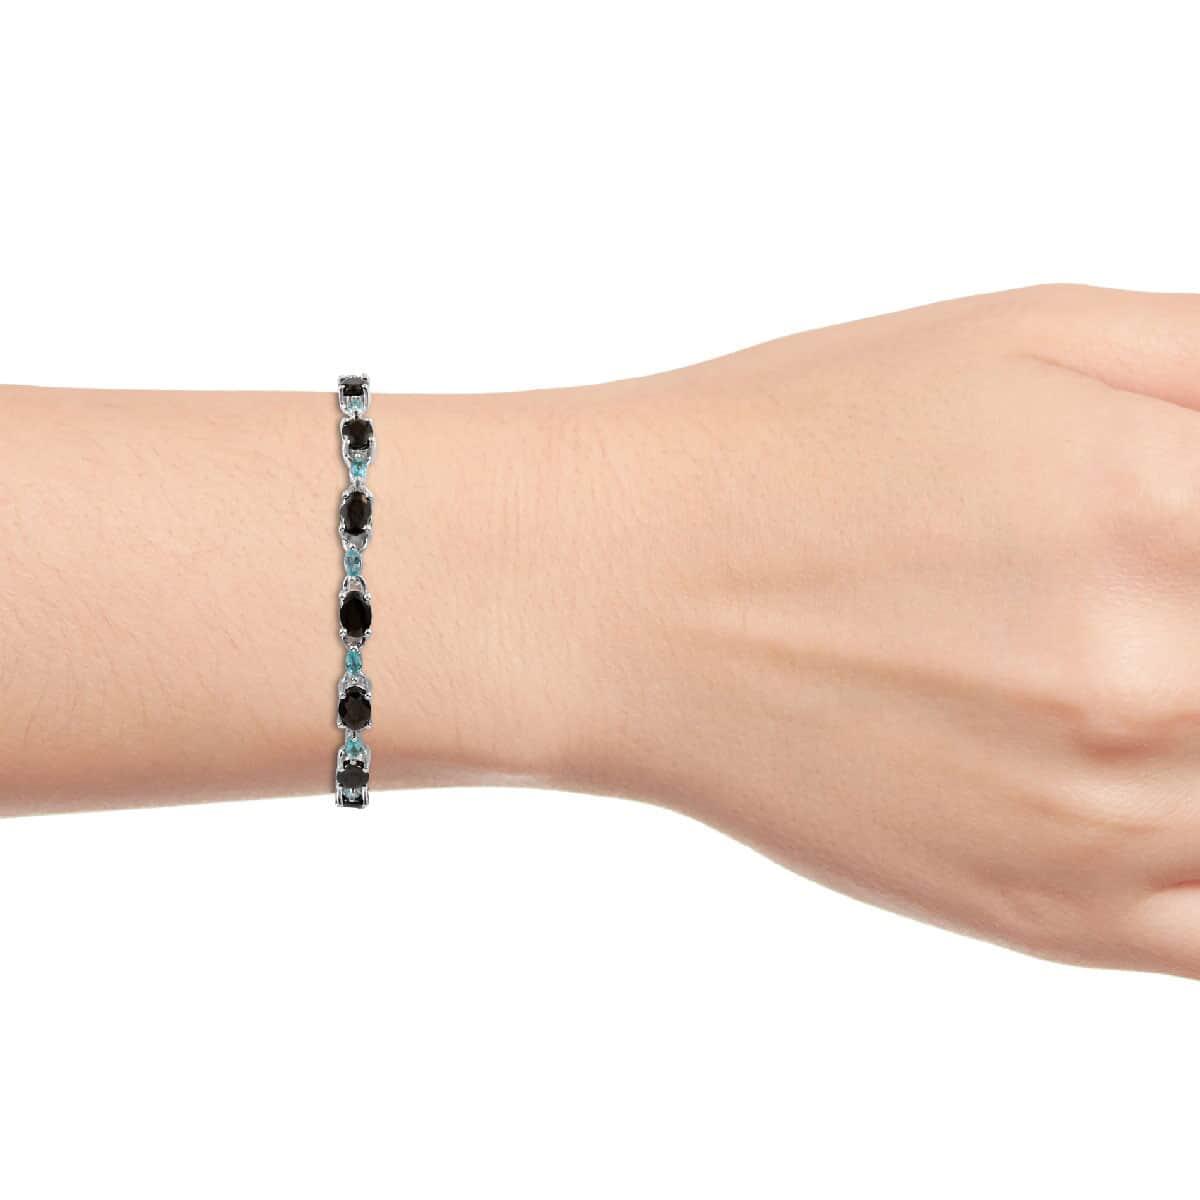 Shungite, Madagascar Paraiba Apatite Bracelet in Platinum Over Sterling Silver (8.00 In) (7.77 g) 7.85 ctw